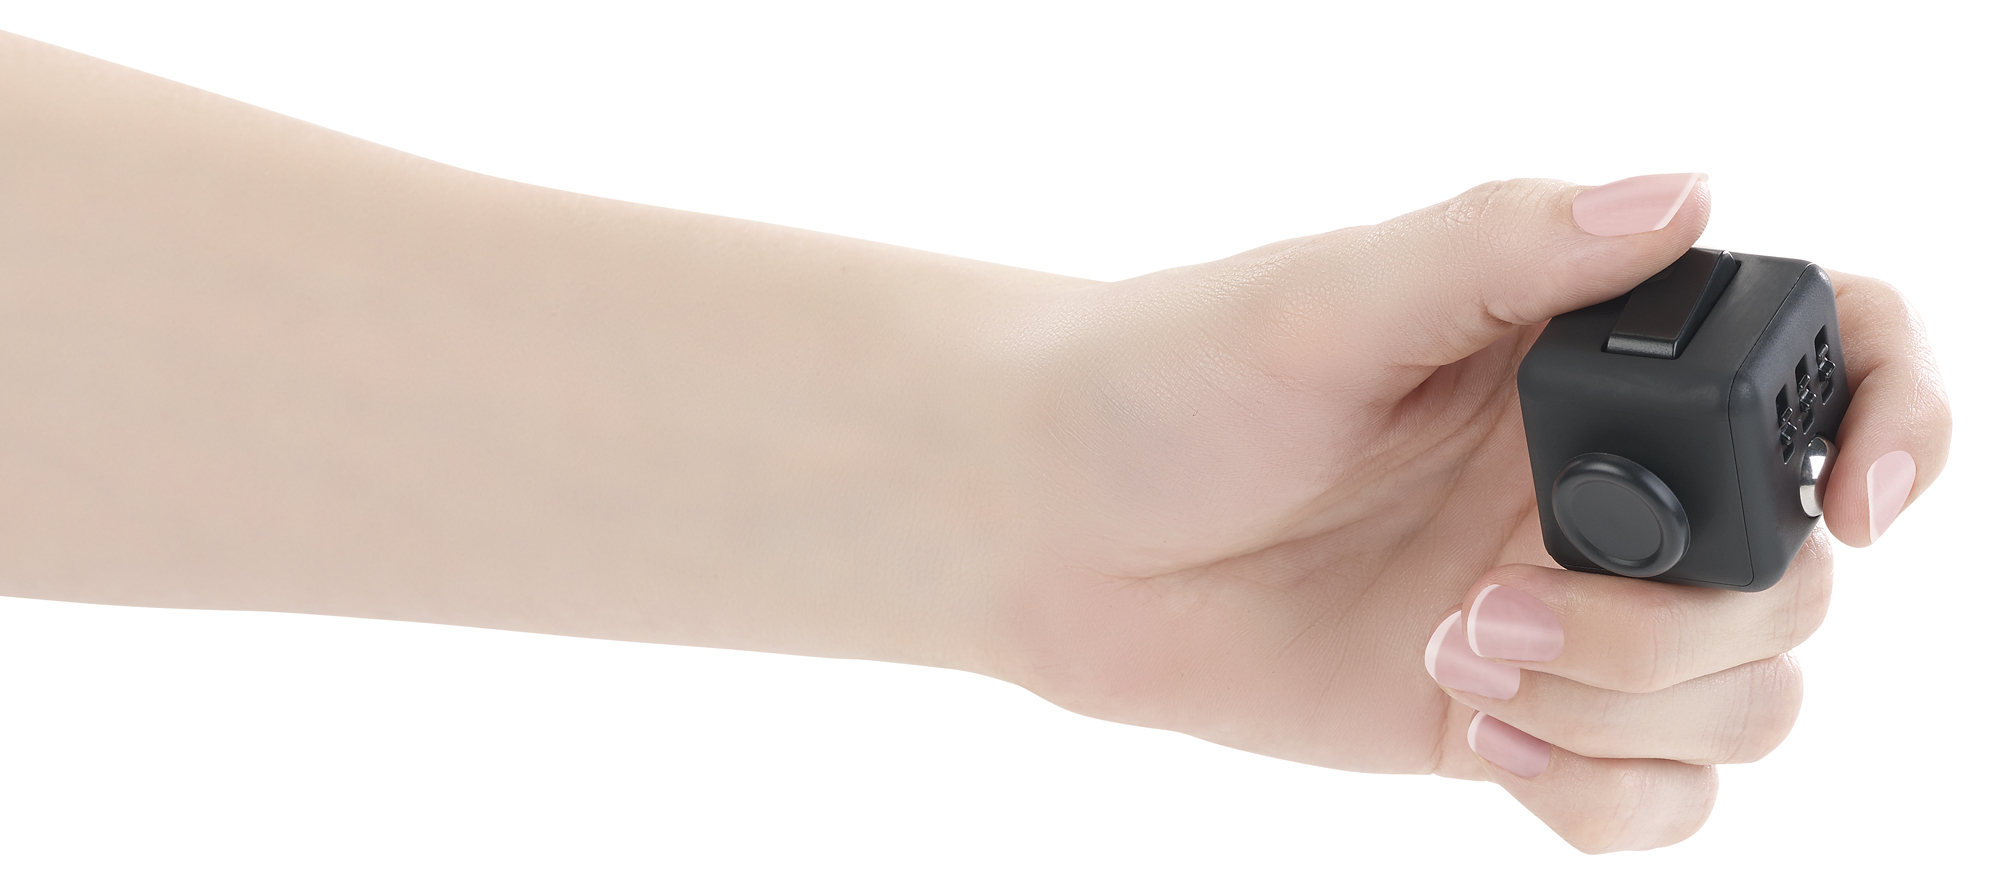 newgen medicals Anti-Stress-Würfel